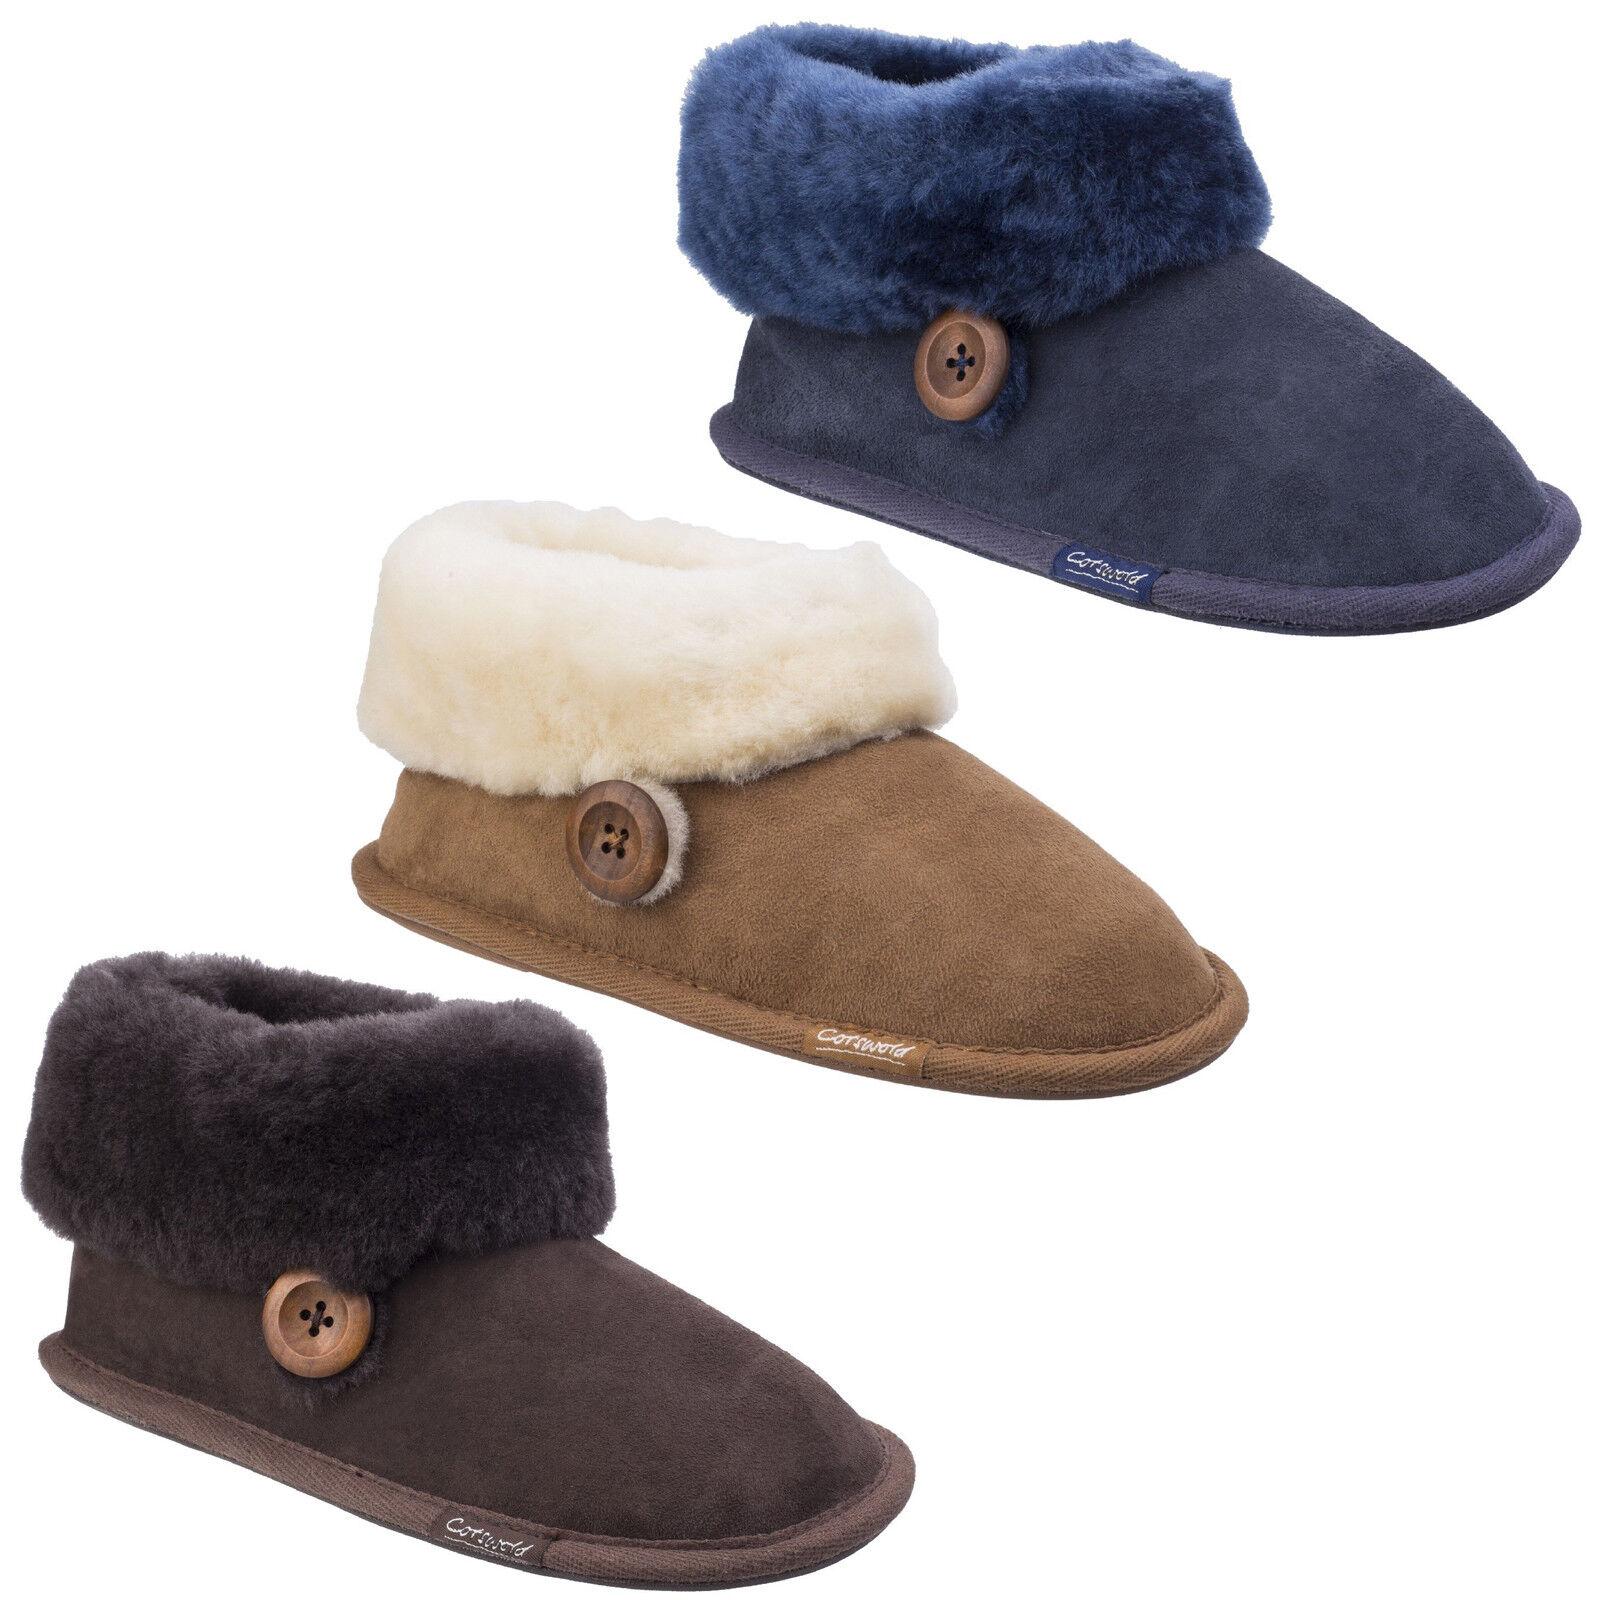 Cotswold Wotton pecora Babuccia Pantofole pelle di pecora Wotton camoscio comfort da infilare 036dbe